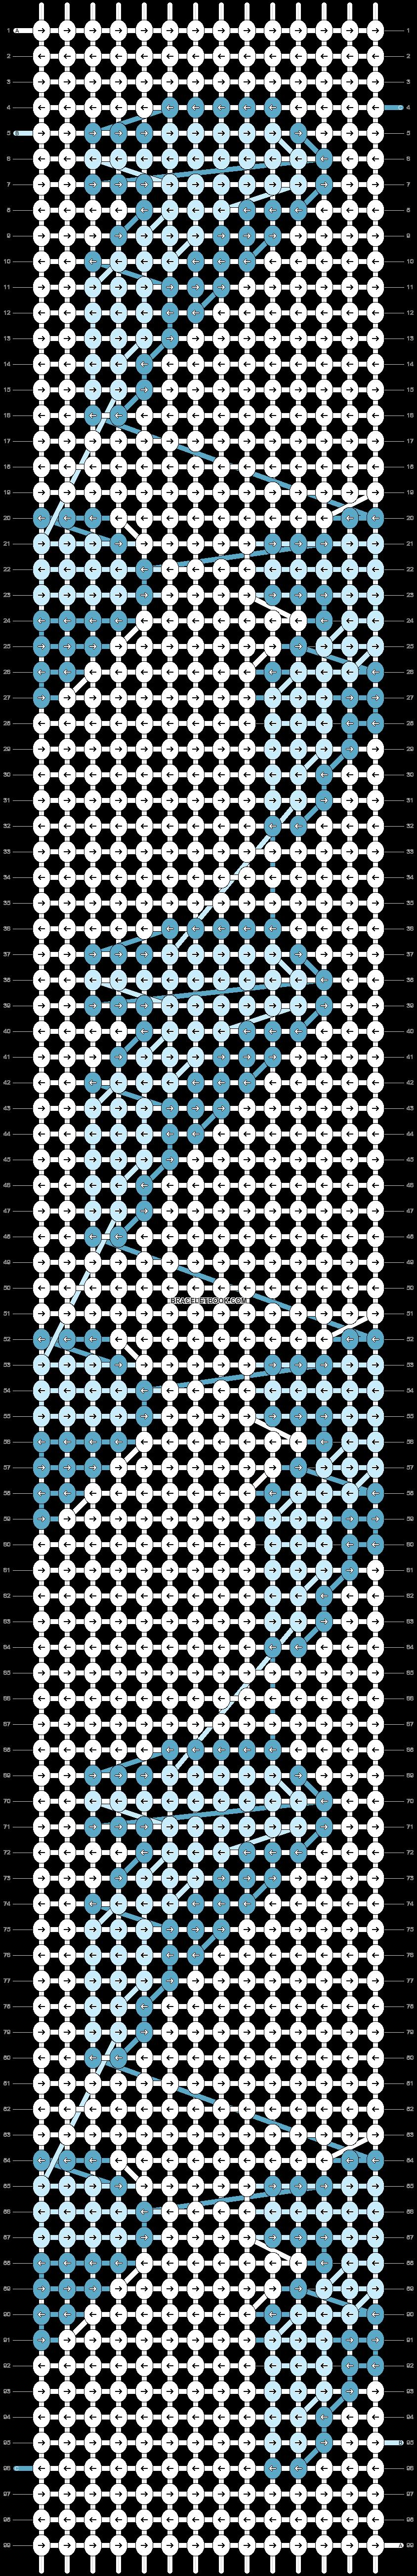 Alpha pattern #72527 pattern